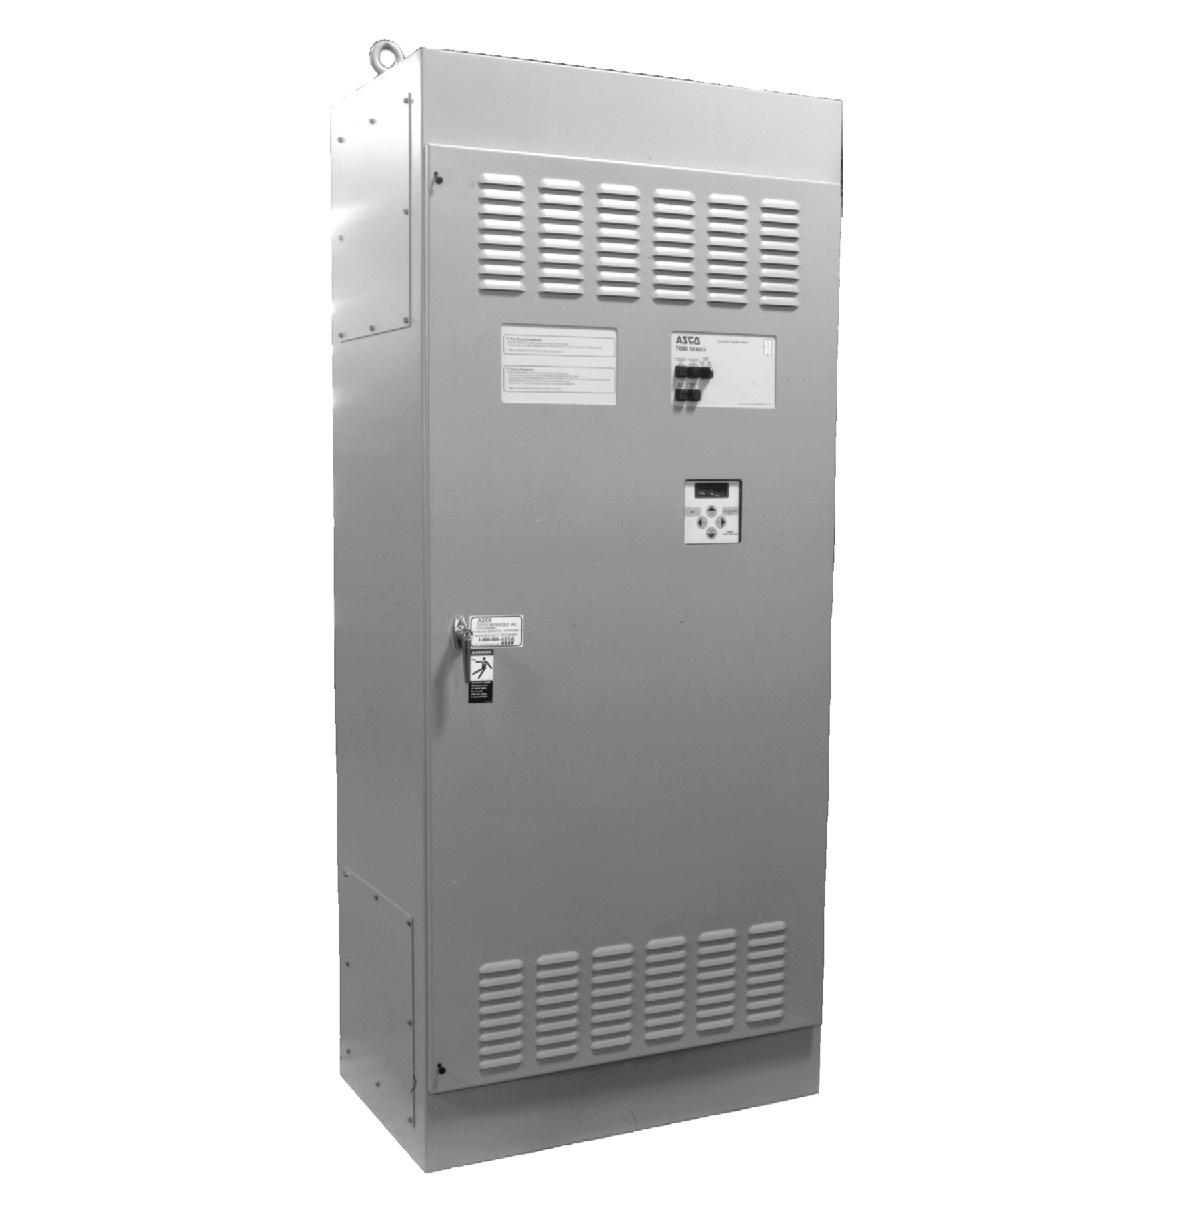 Asco 7000 Auto Transfer Switch (1Ph, 1200A)